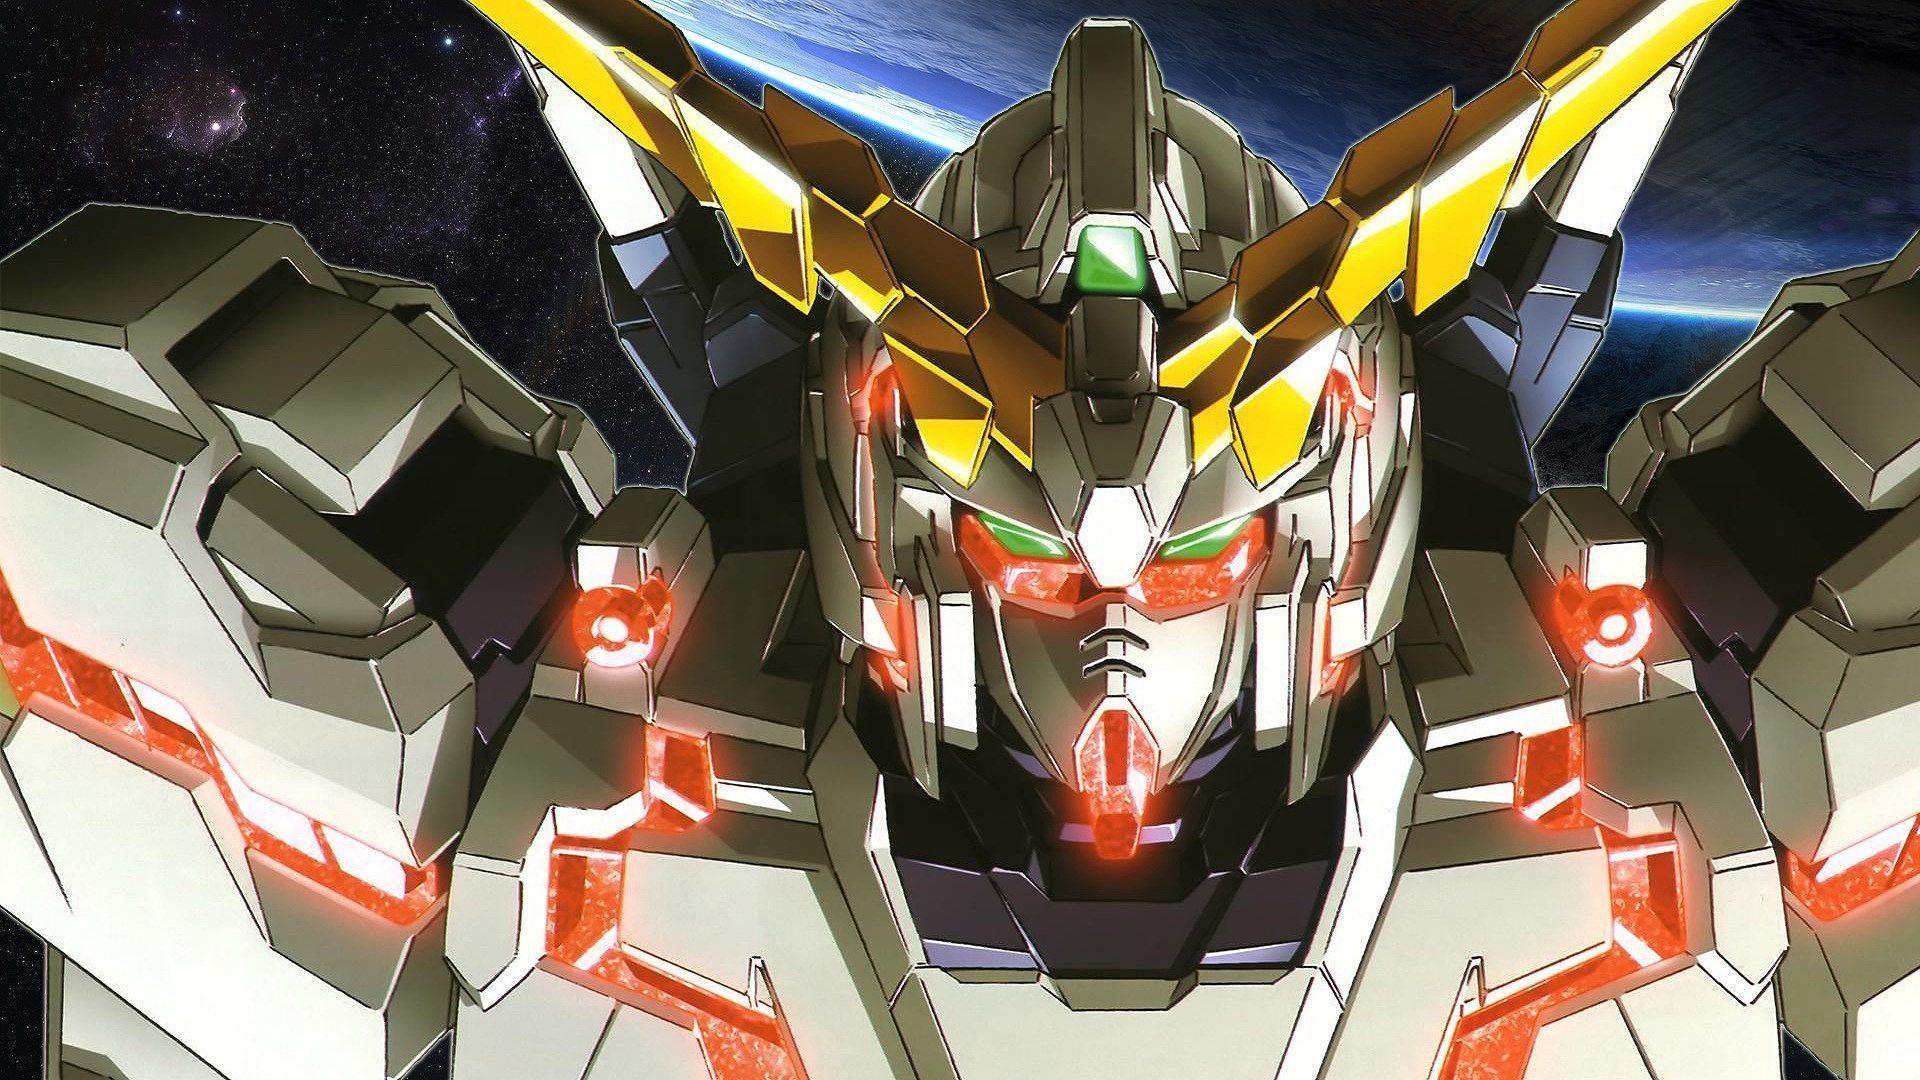 Gundam Unicorn Anime Wallpaper Wide or HD | Anime Wallpapers